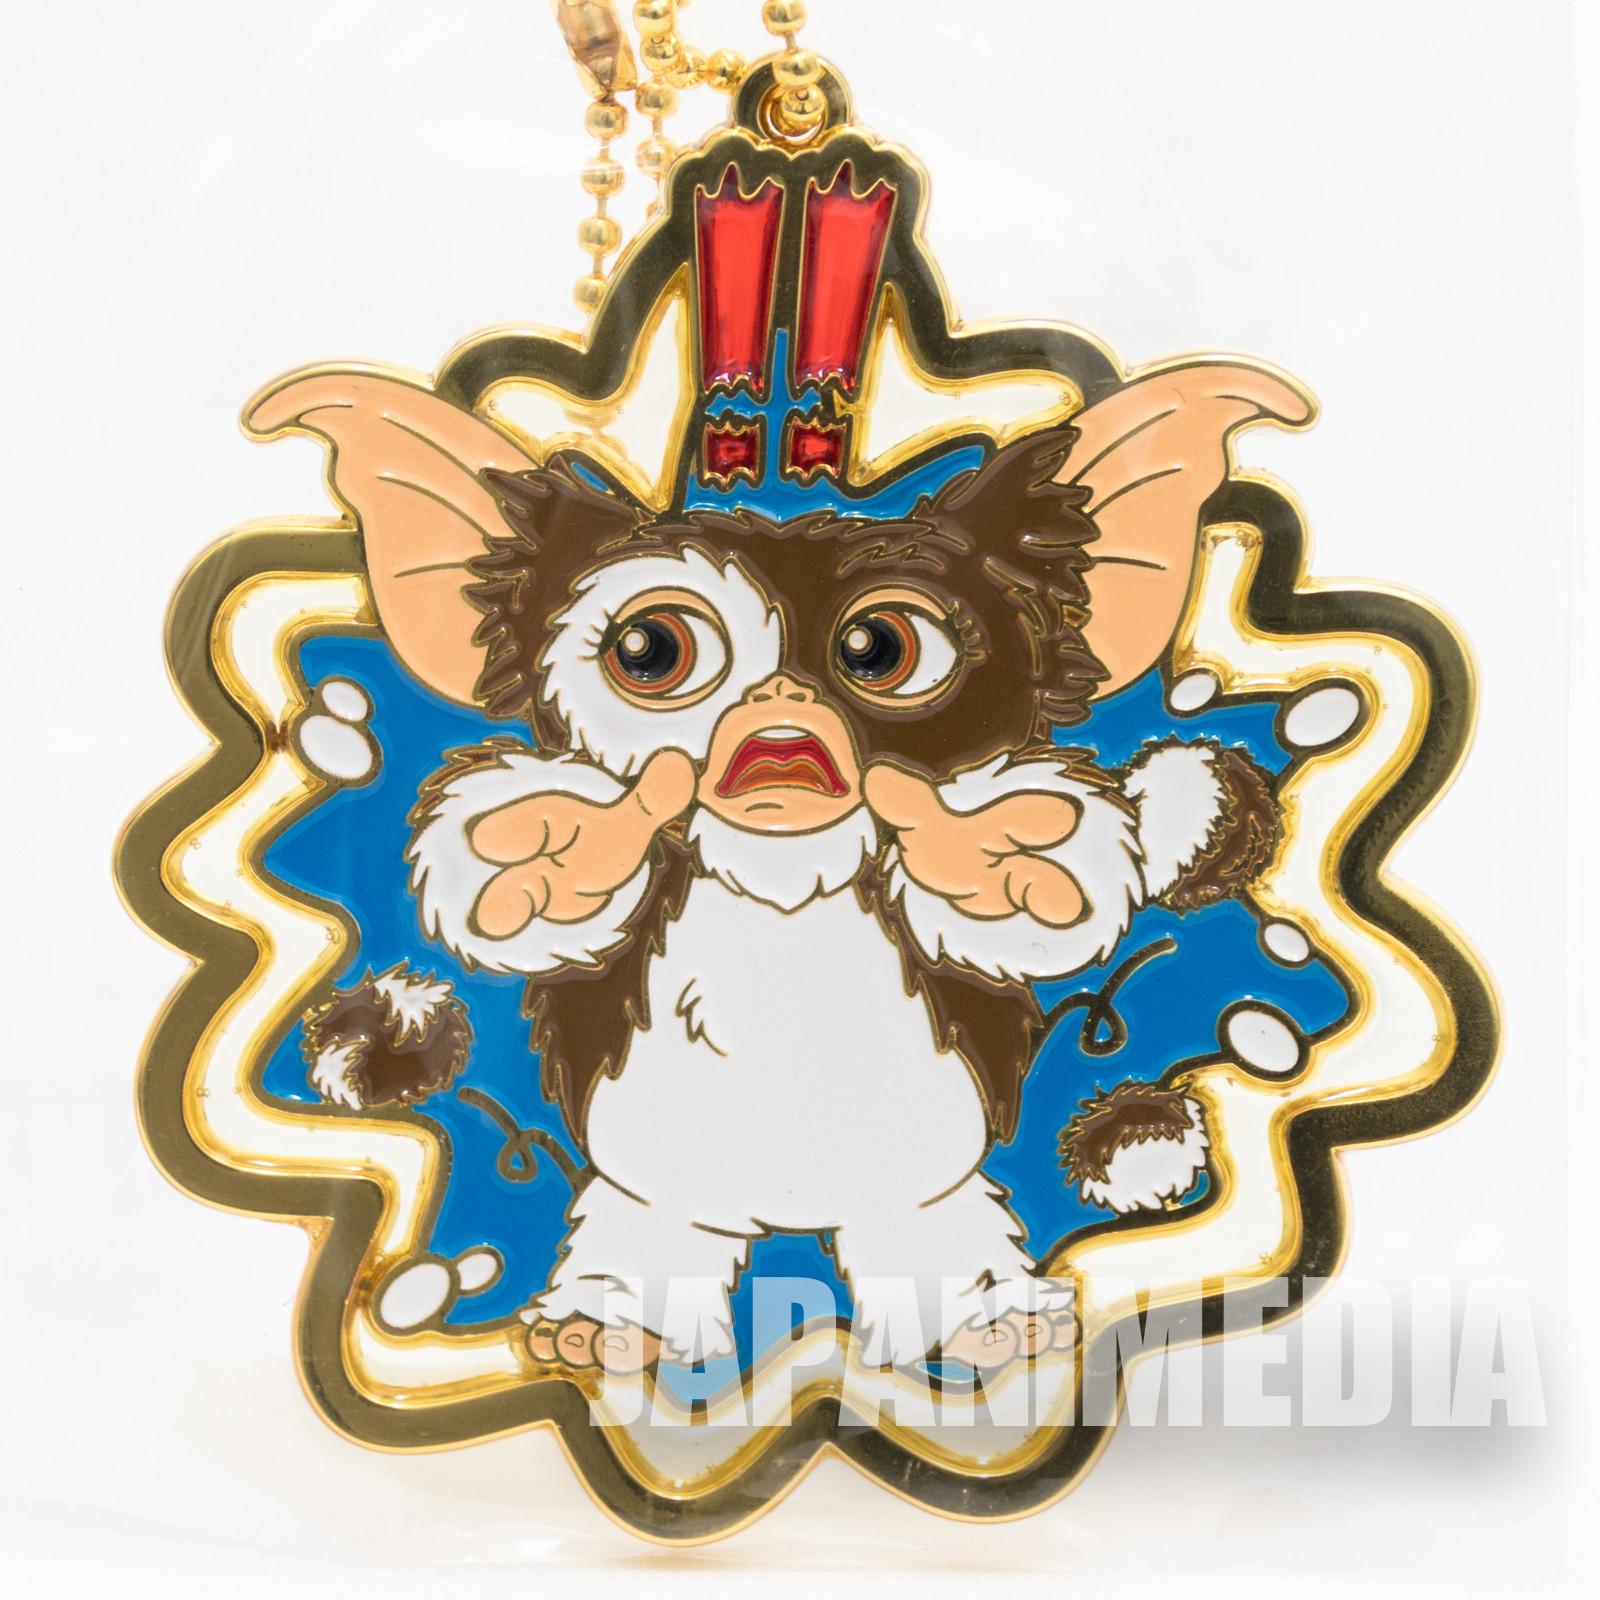 Gremlins Gizmo Metal Mascot Charm Ballchain #5 SK JAPAN